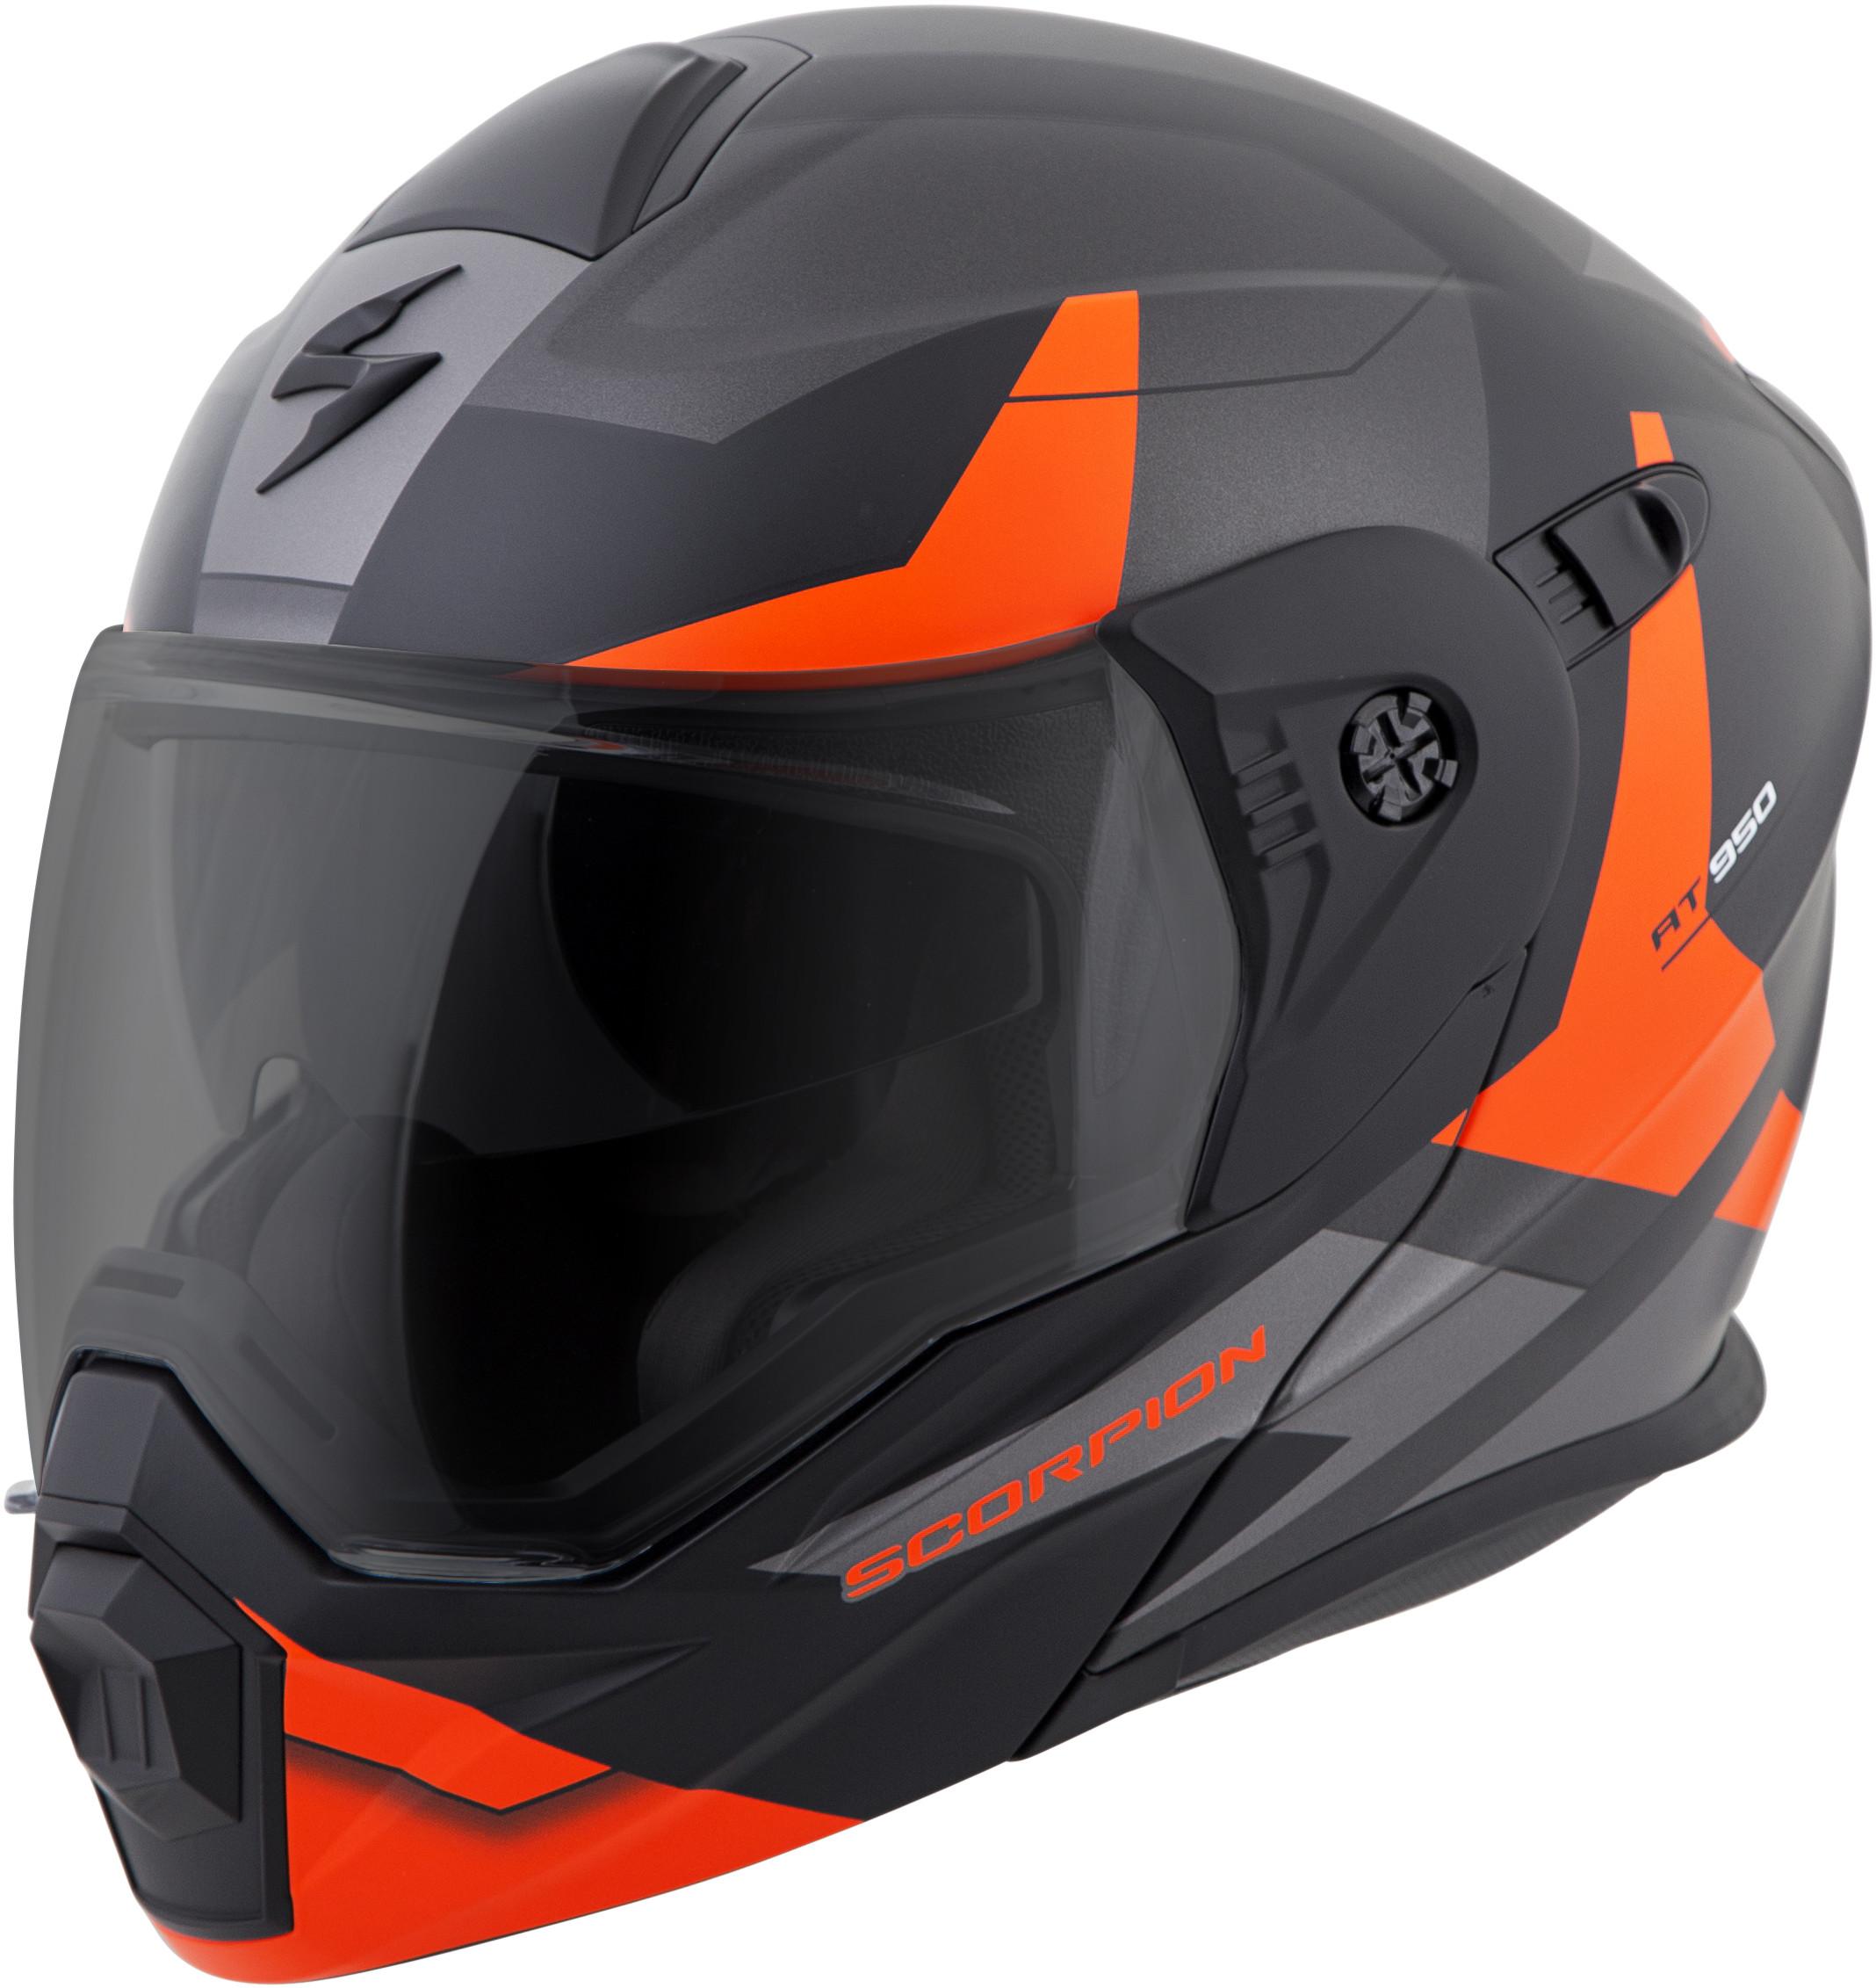 for-Scorpion-Helmet-EXO-AT950-Neocon-Snow-Helmet-with-Dual-Lens-Shield miniature 14